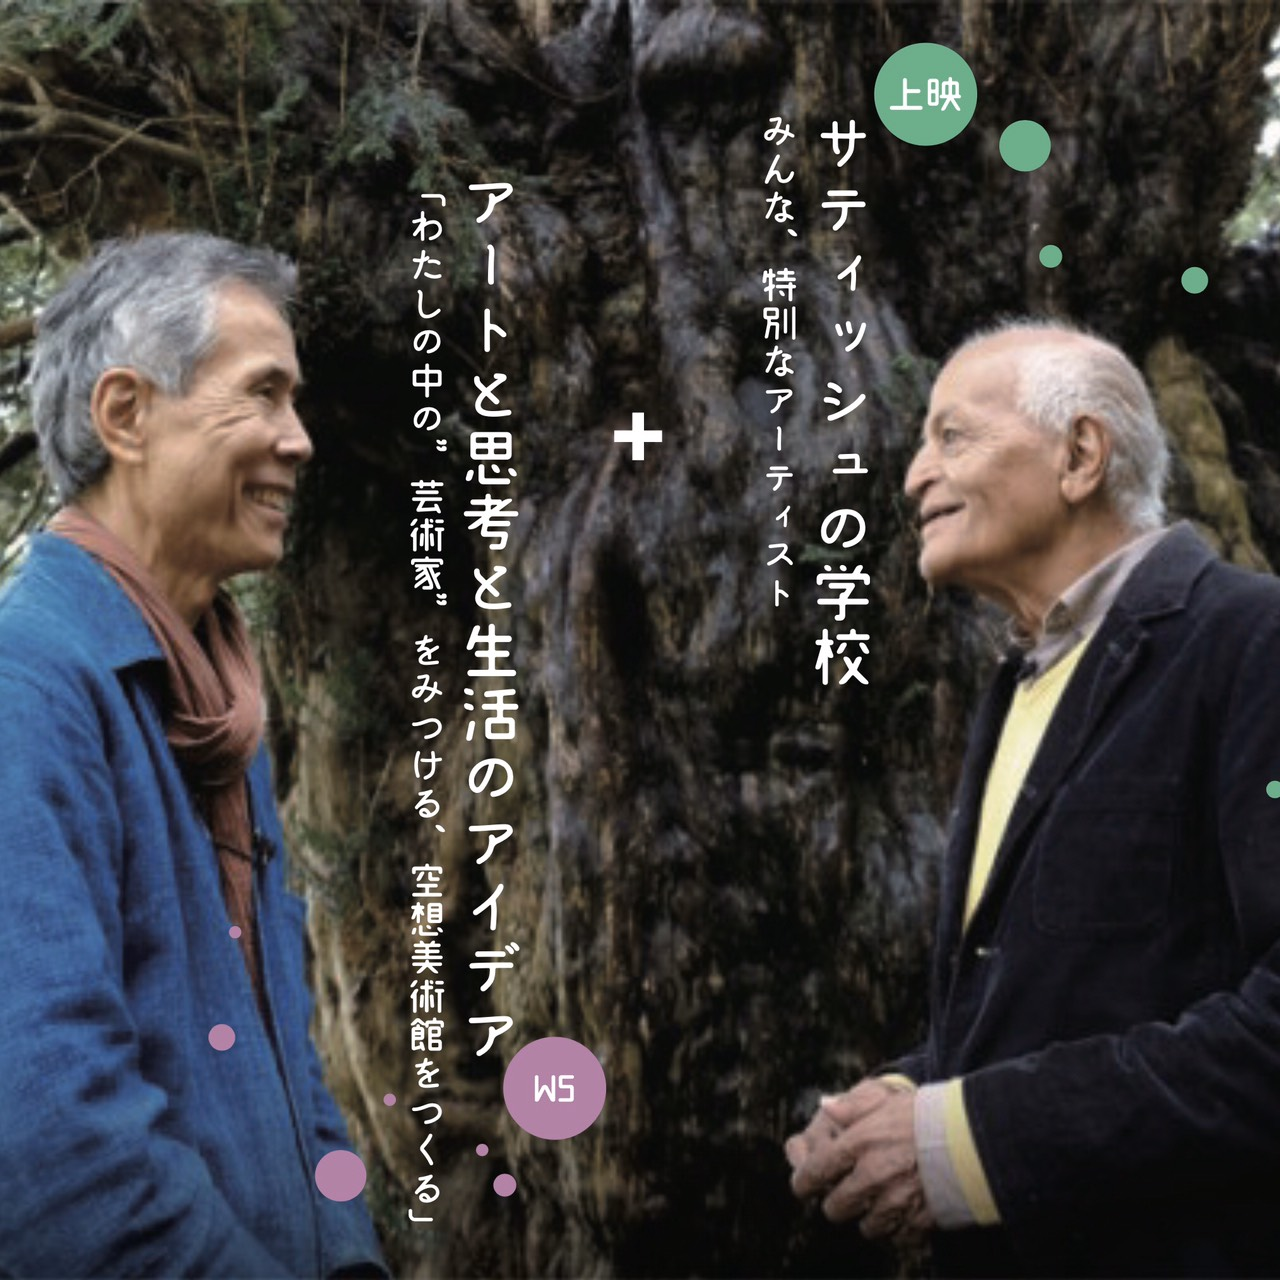 "mumokuteki cinema vol.9 🎬『サティシュの学校 みんな、特別なアーティスト』 上映+アートと思考と生活のアイデア「わたしの中の""芸術家""をみつける、空想美術館をつくる」ワークショップ"